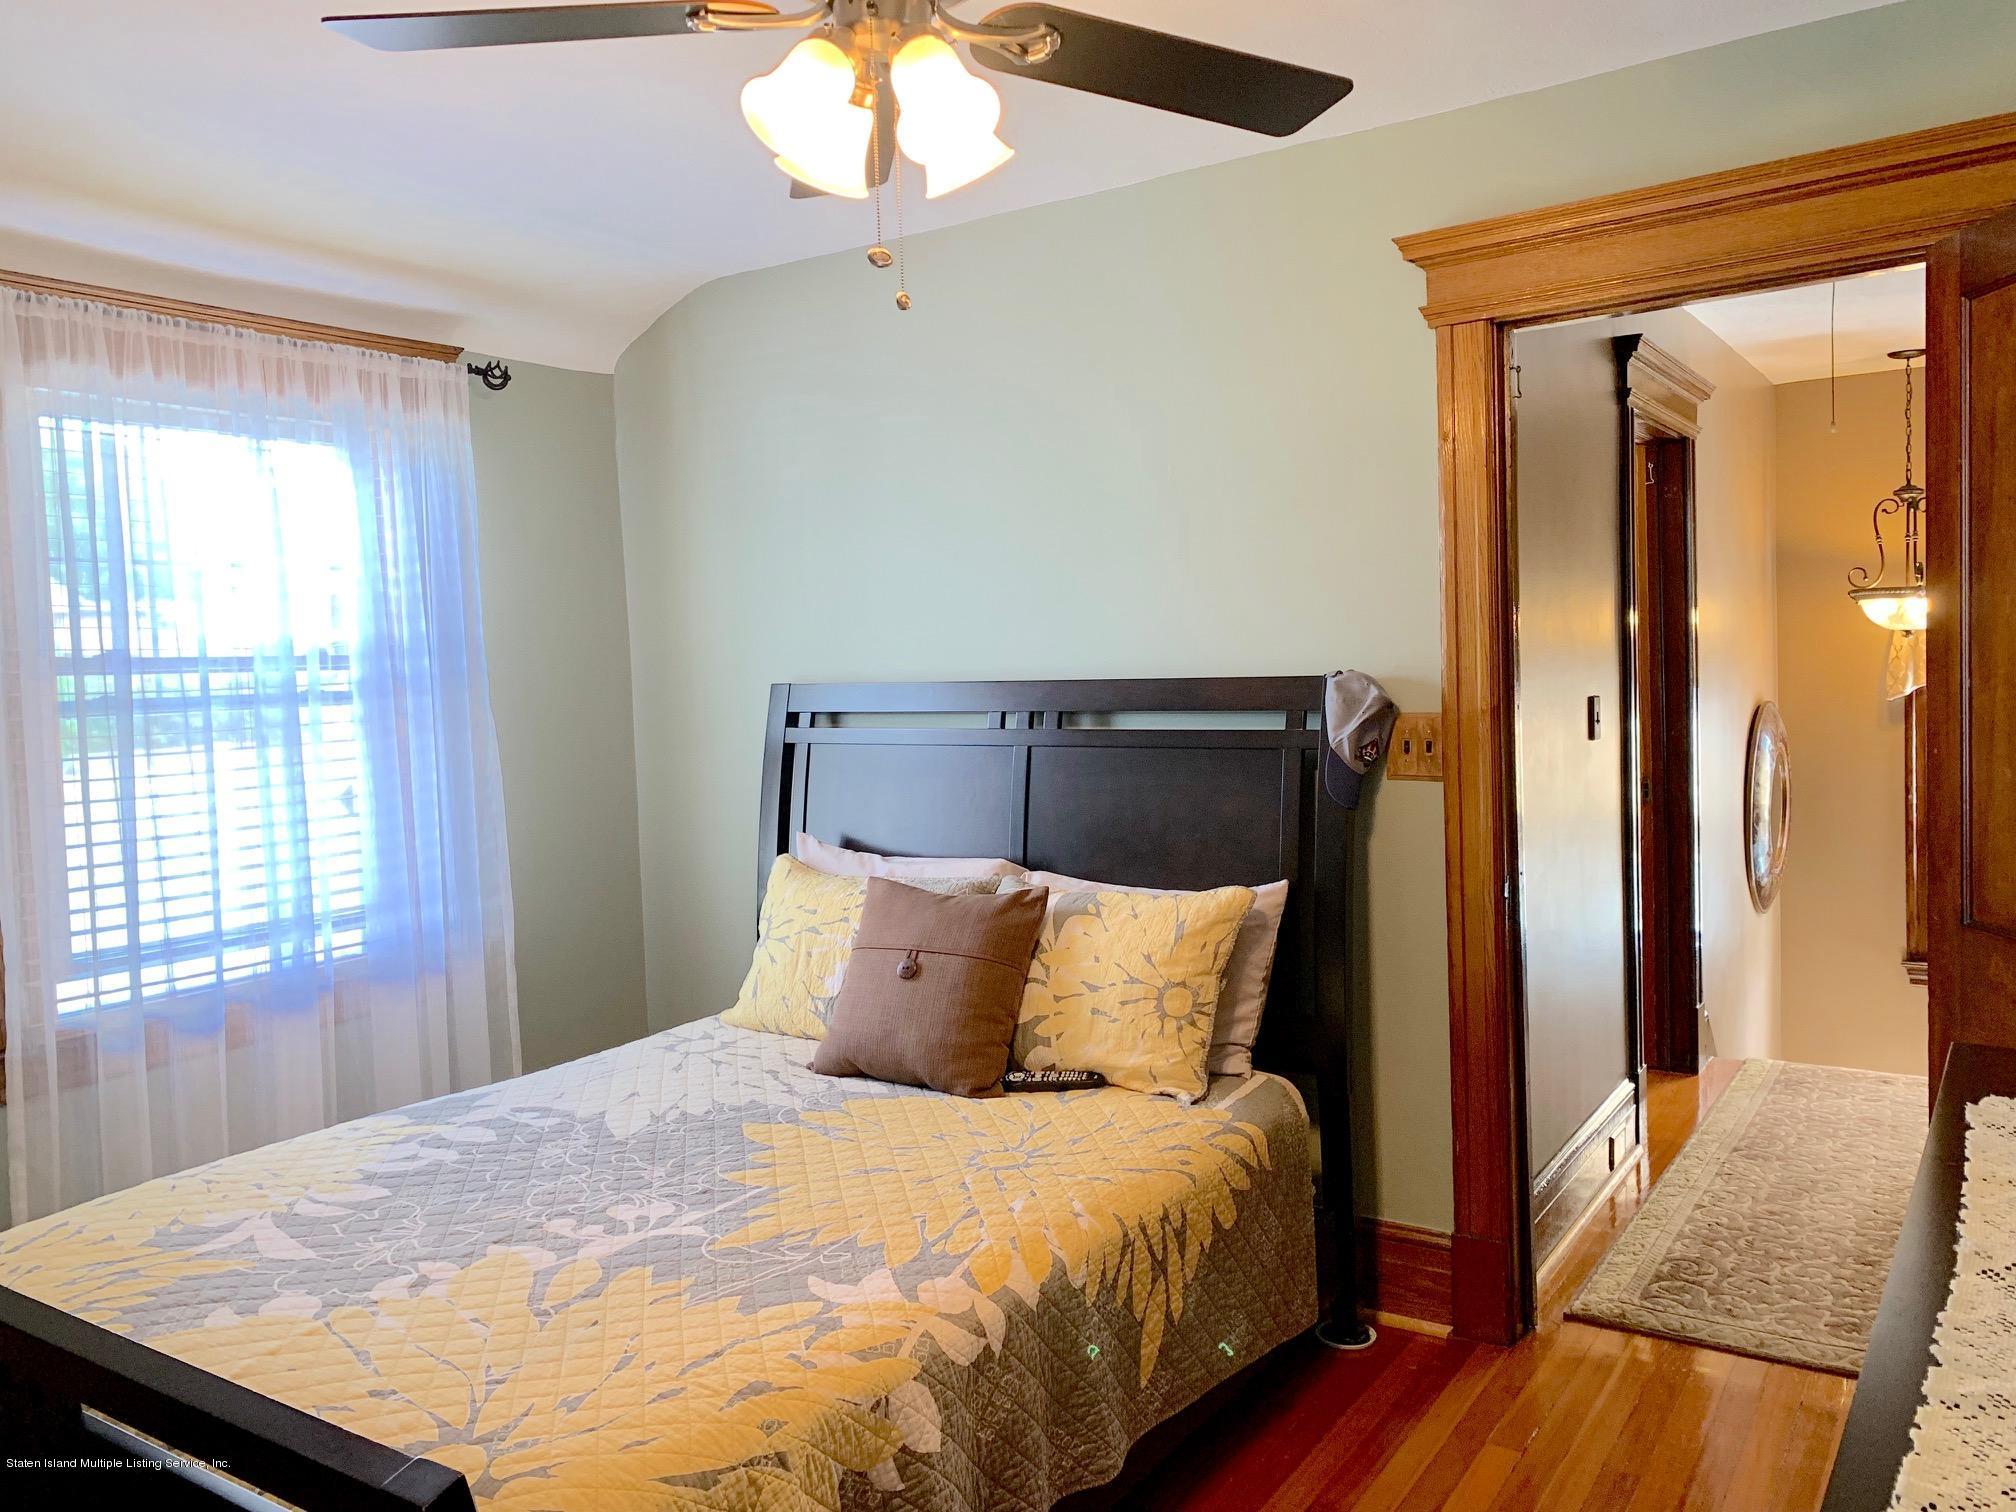 Single Family - Detached 195 Fairview Avenue  Staten Island, NY 10314, MLS-1132423-29